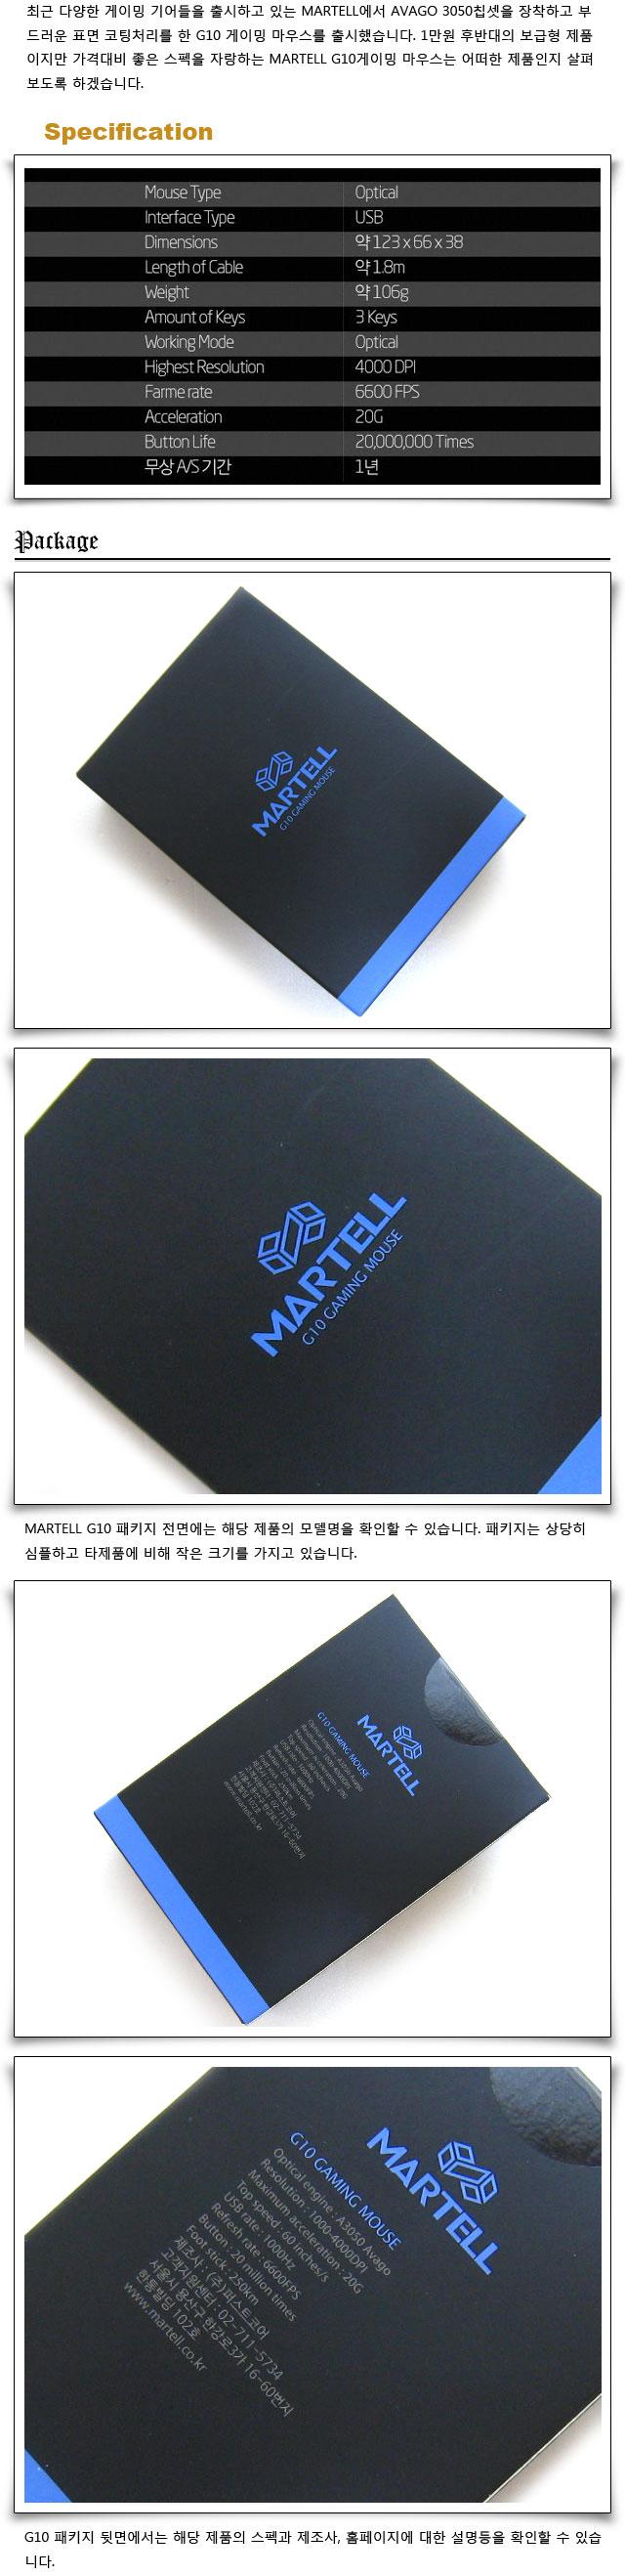 MARTELL_02.jpg